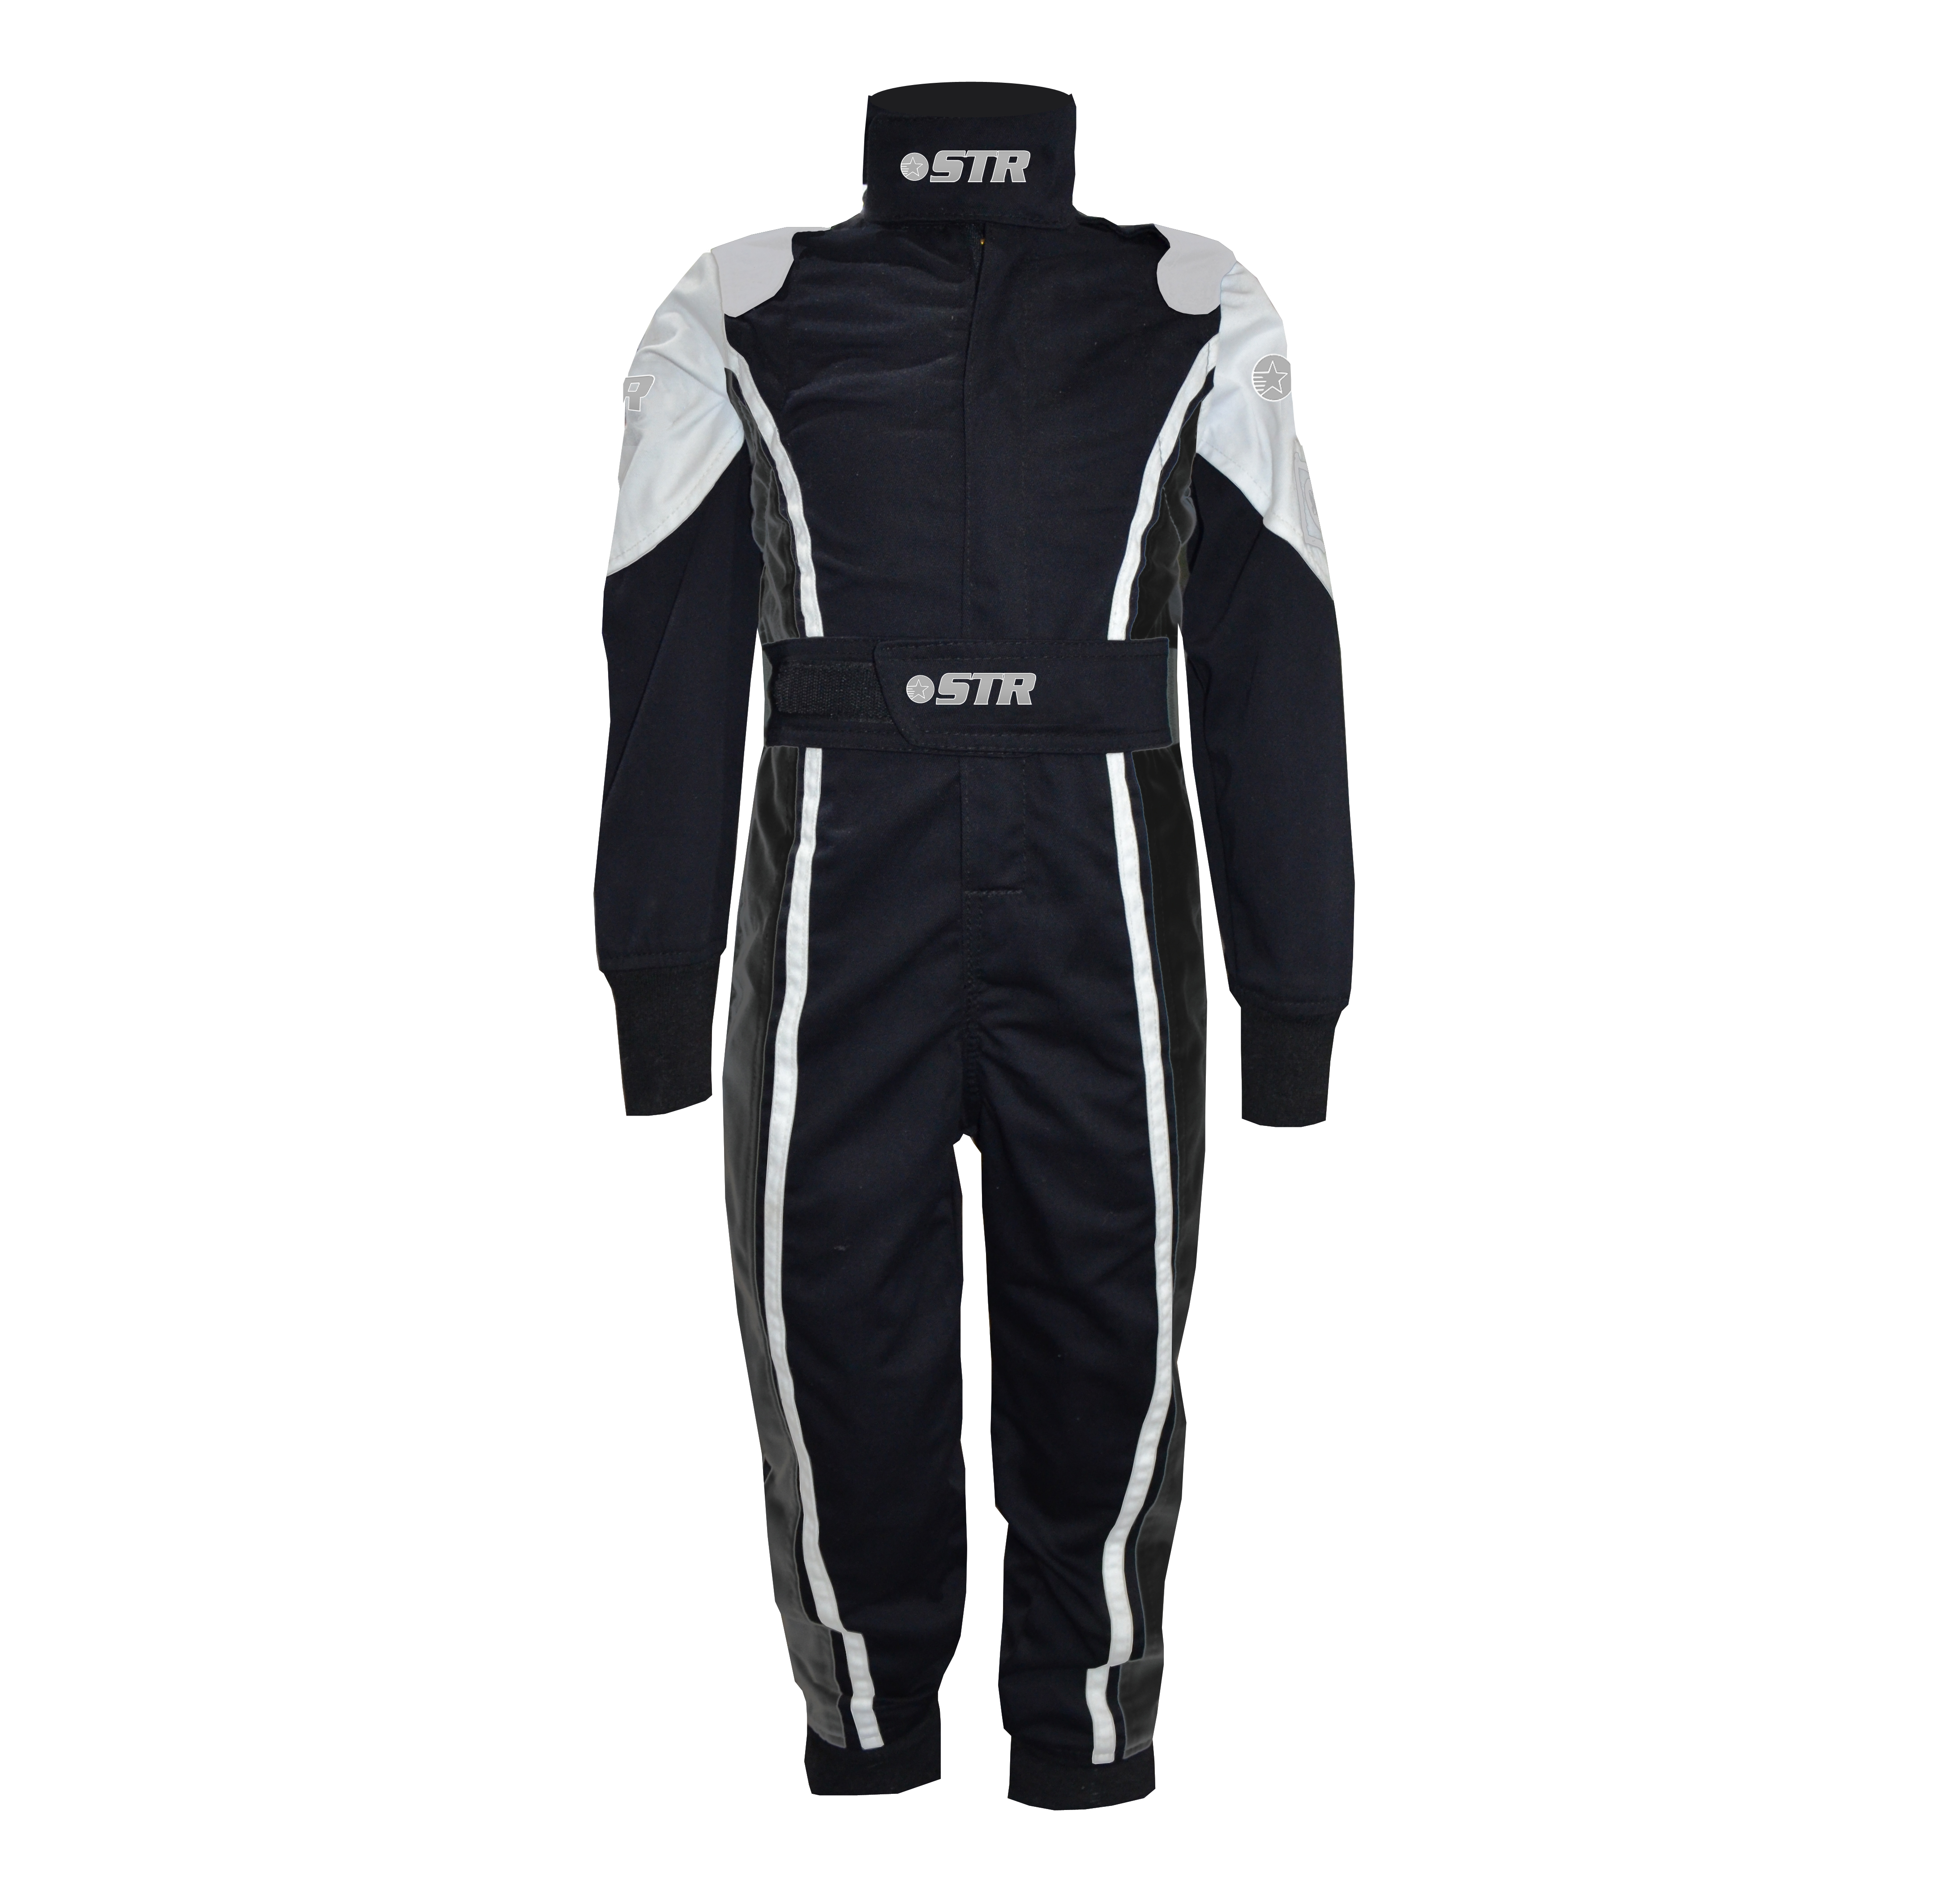 STR Youth 'Comfort' Race Suit - Black/White